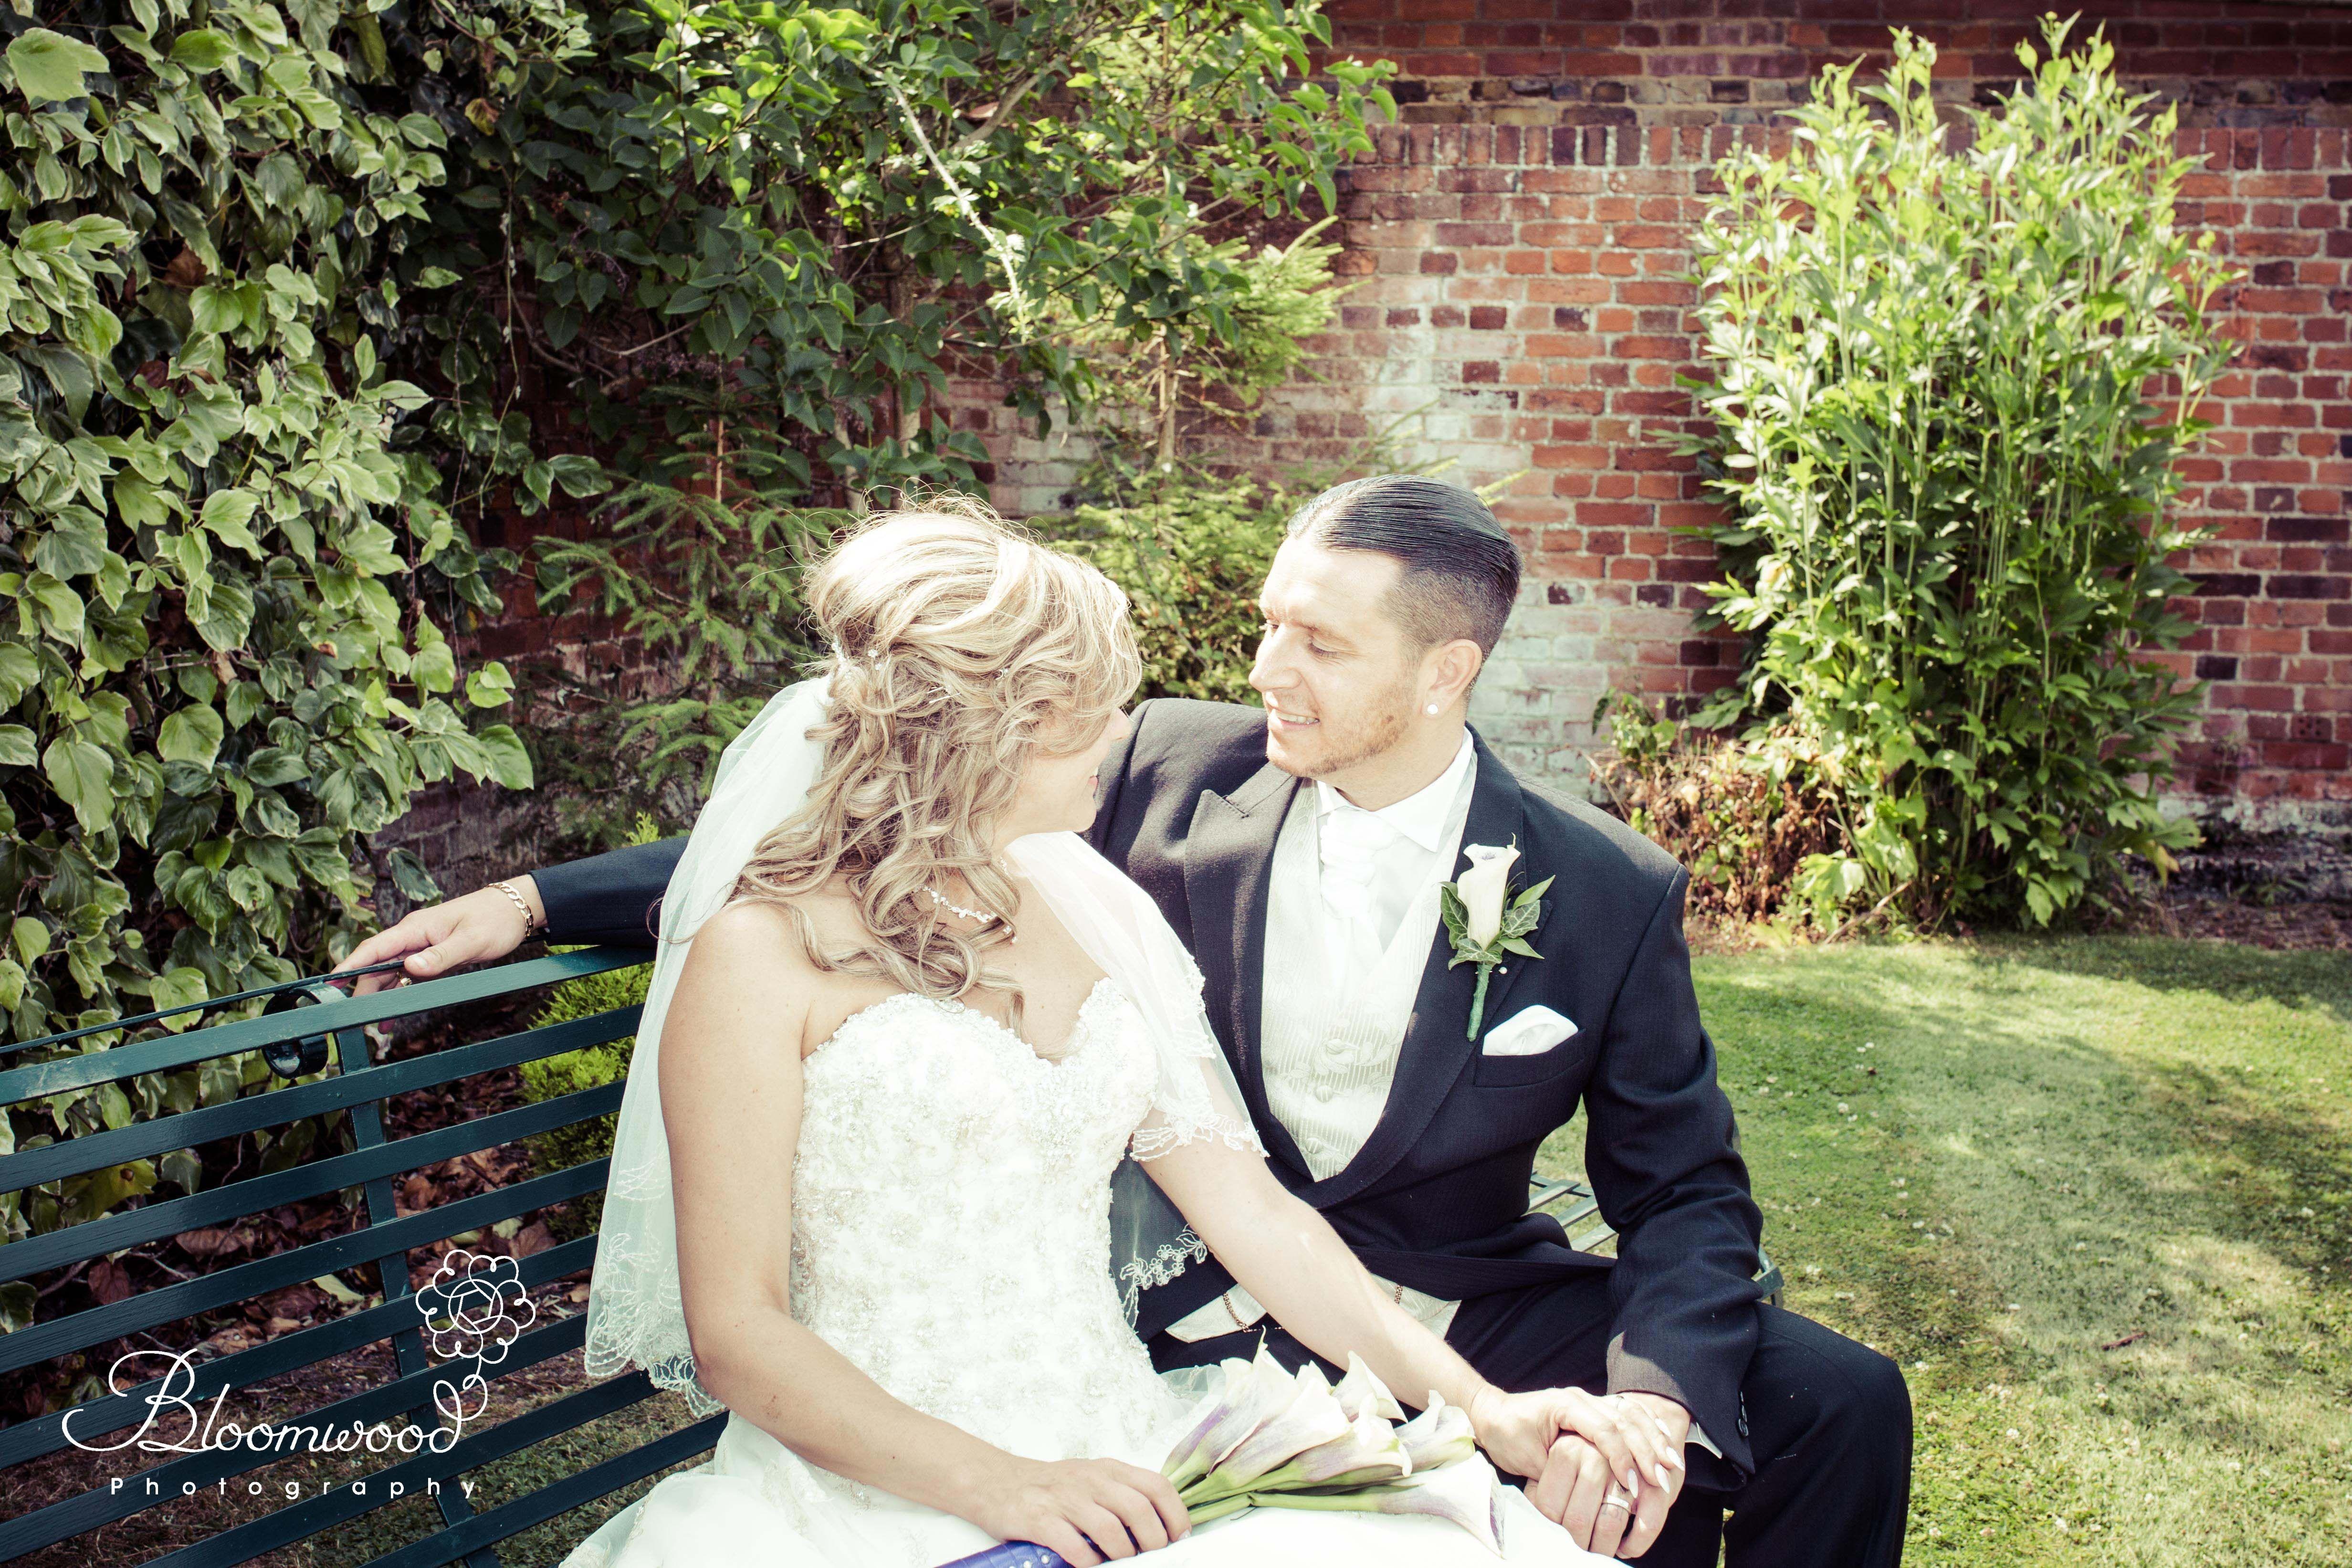 Beautiful bride & groom having a precious moment together ...